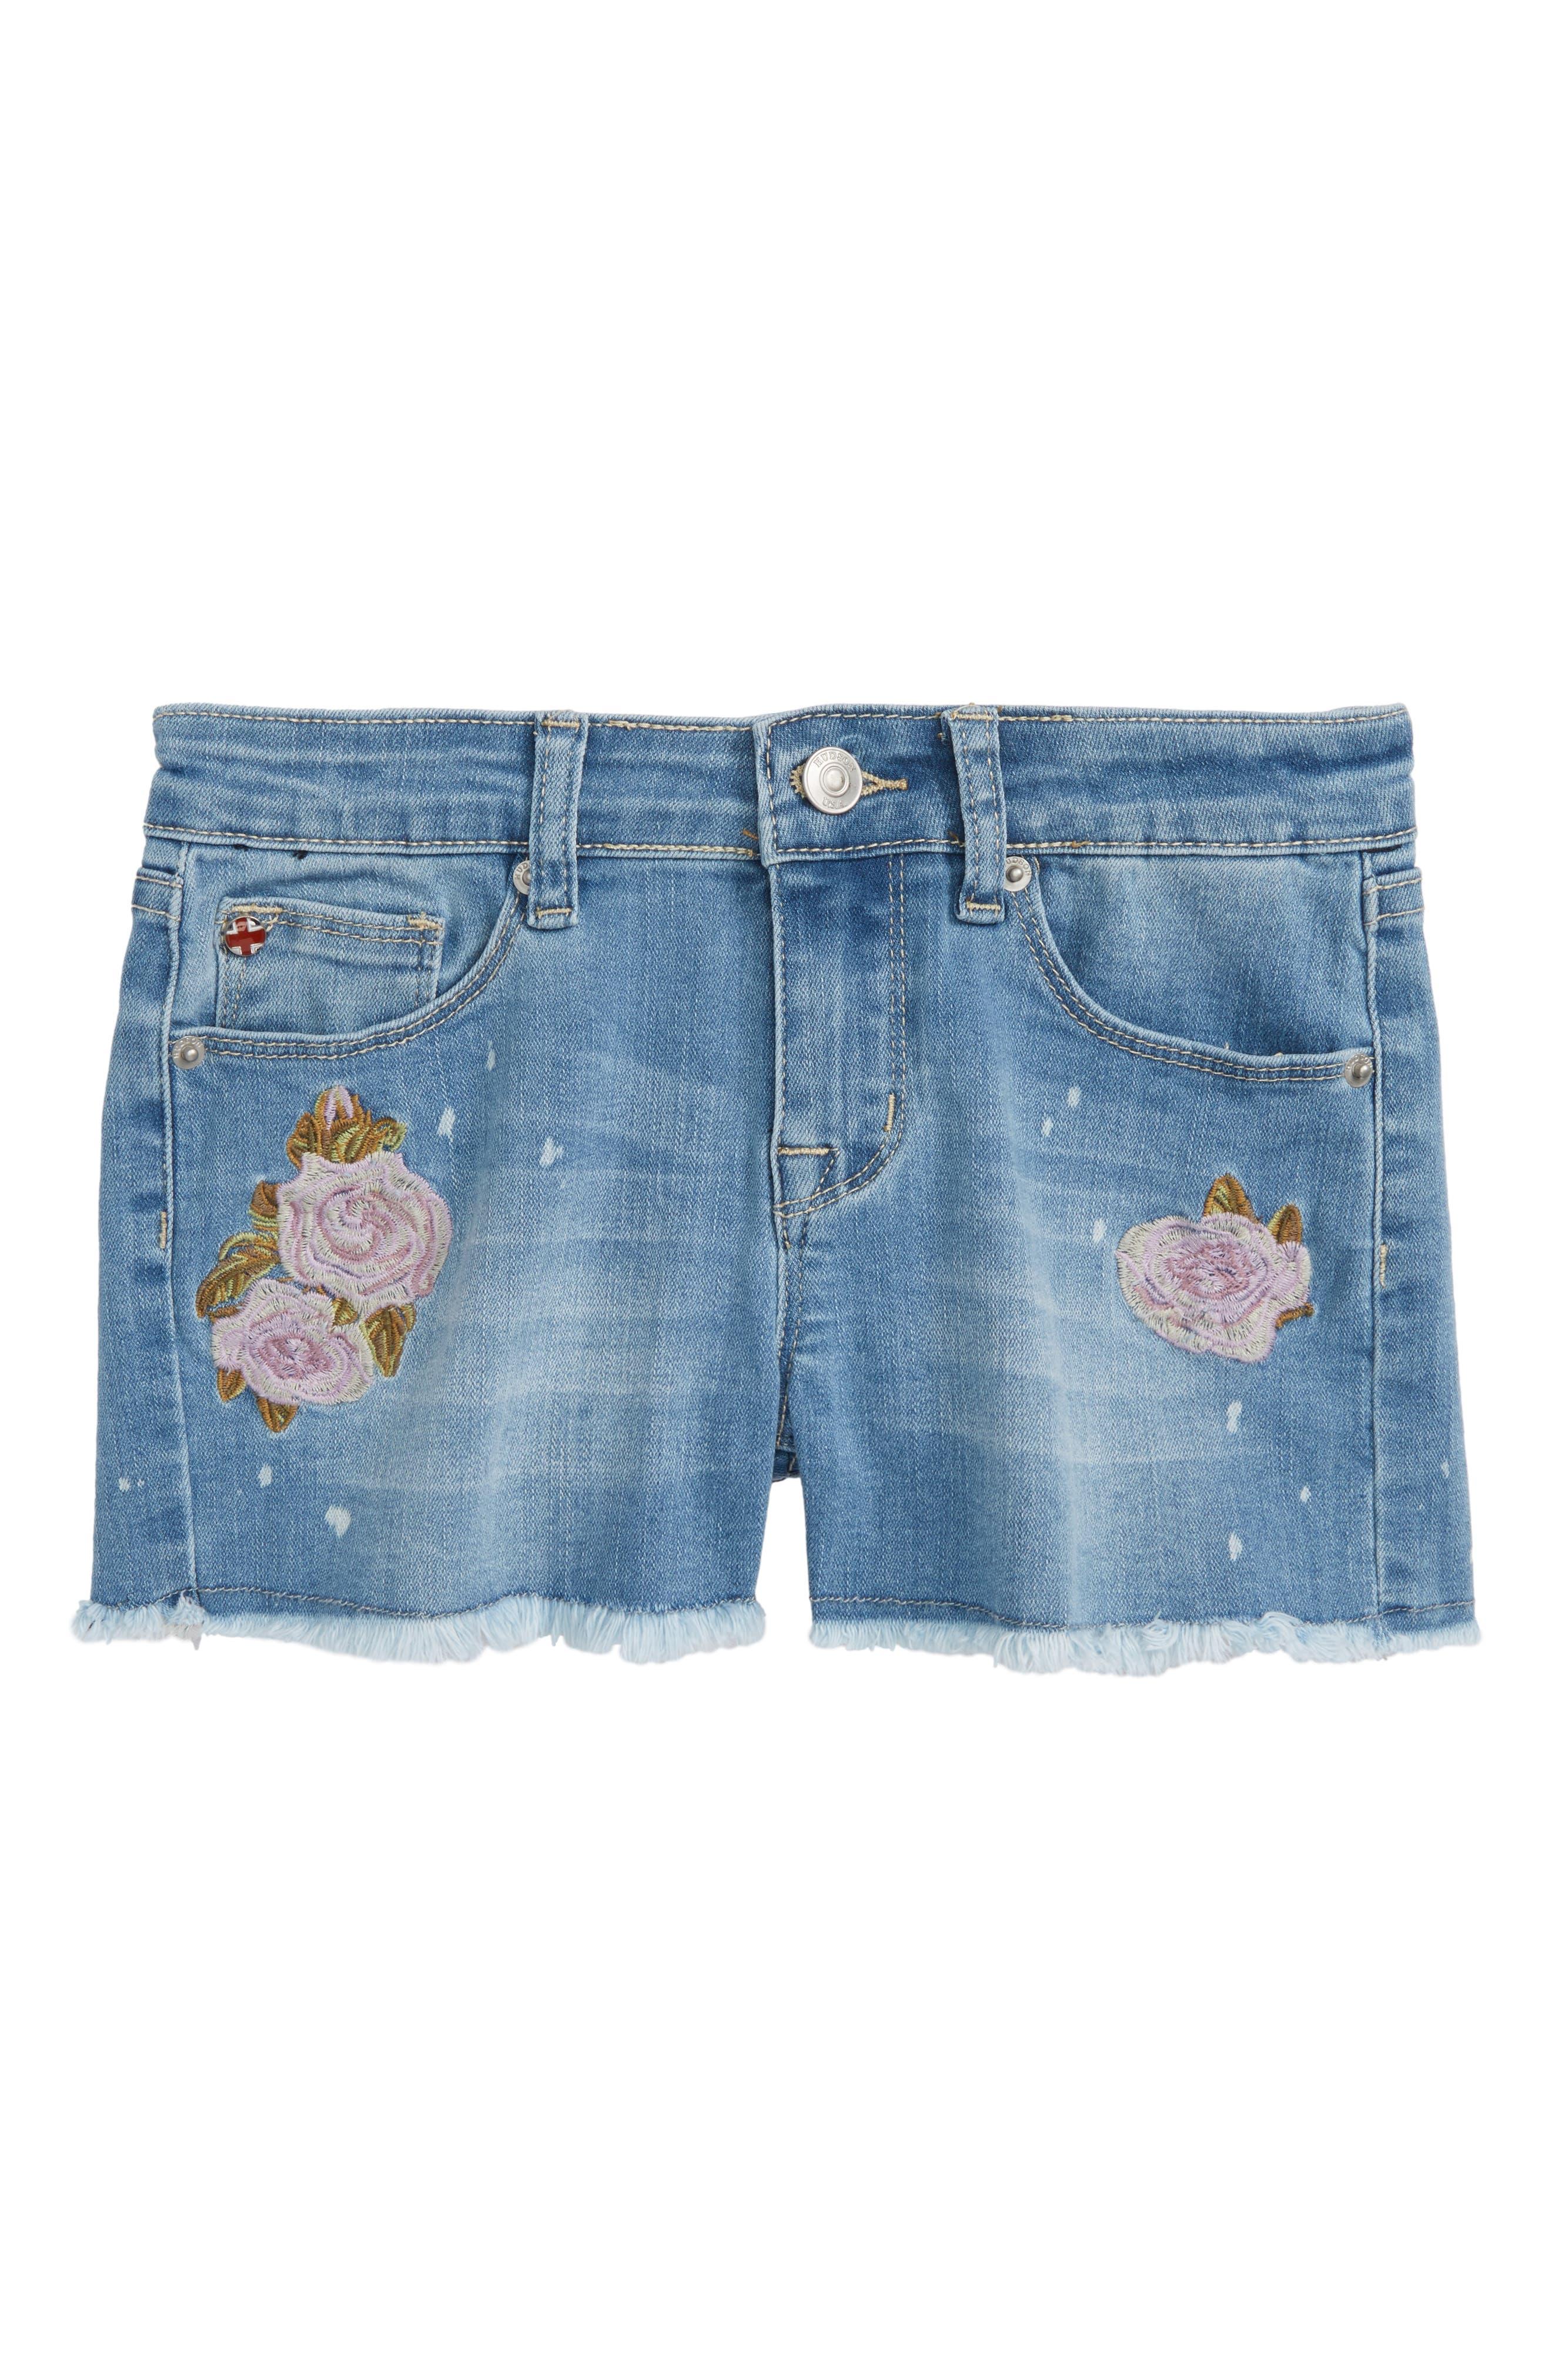 Floral Appliqué Fray Shorts,                             Main thumbnail 1, color,                             Whatever Wash